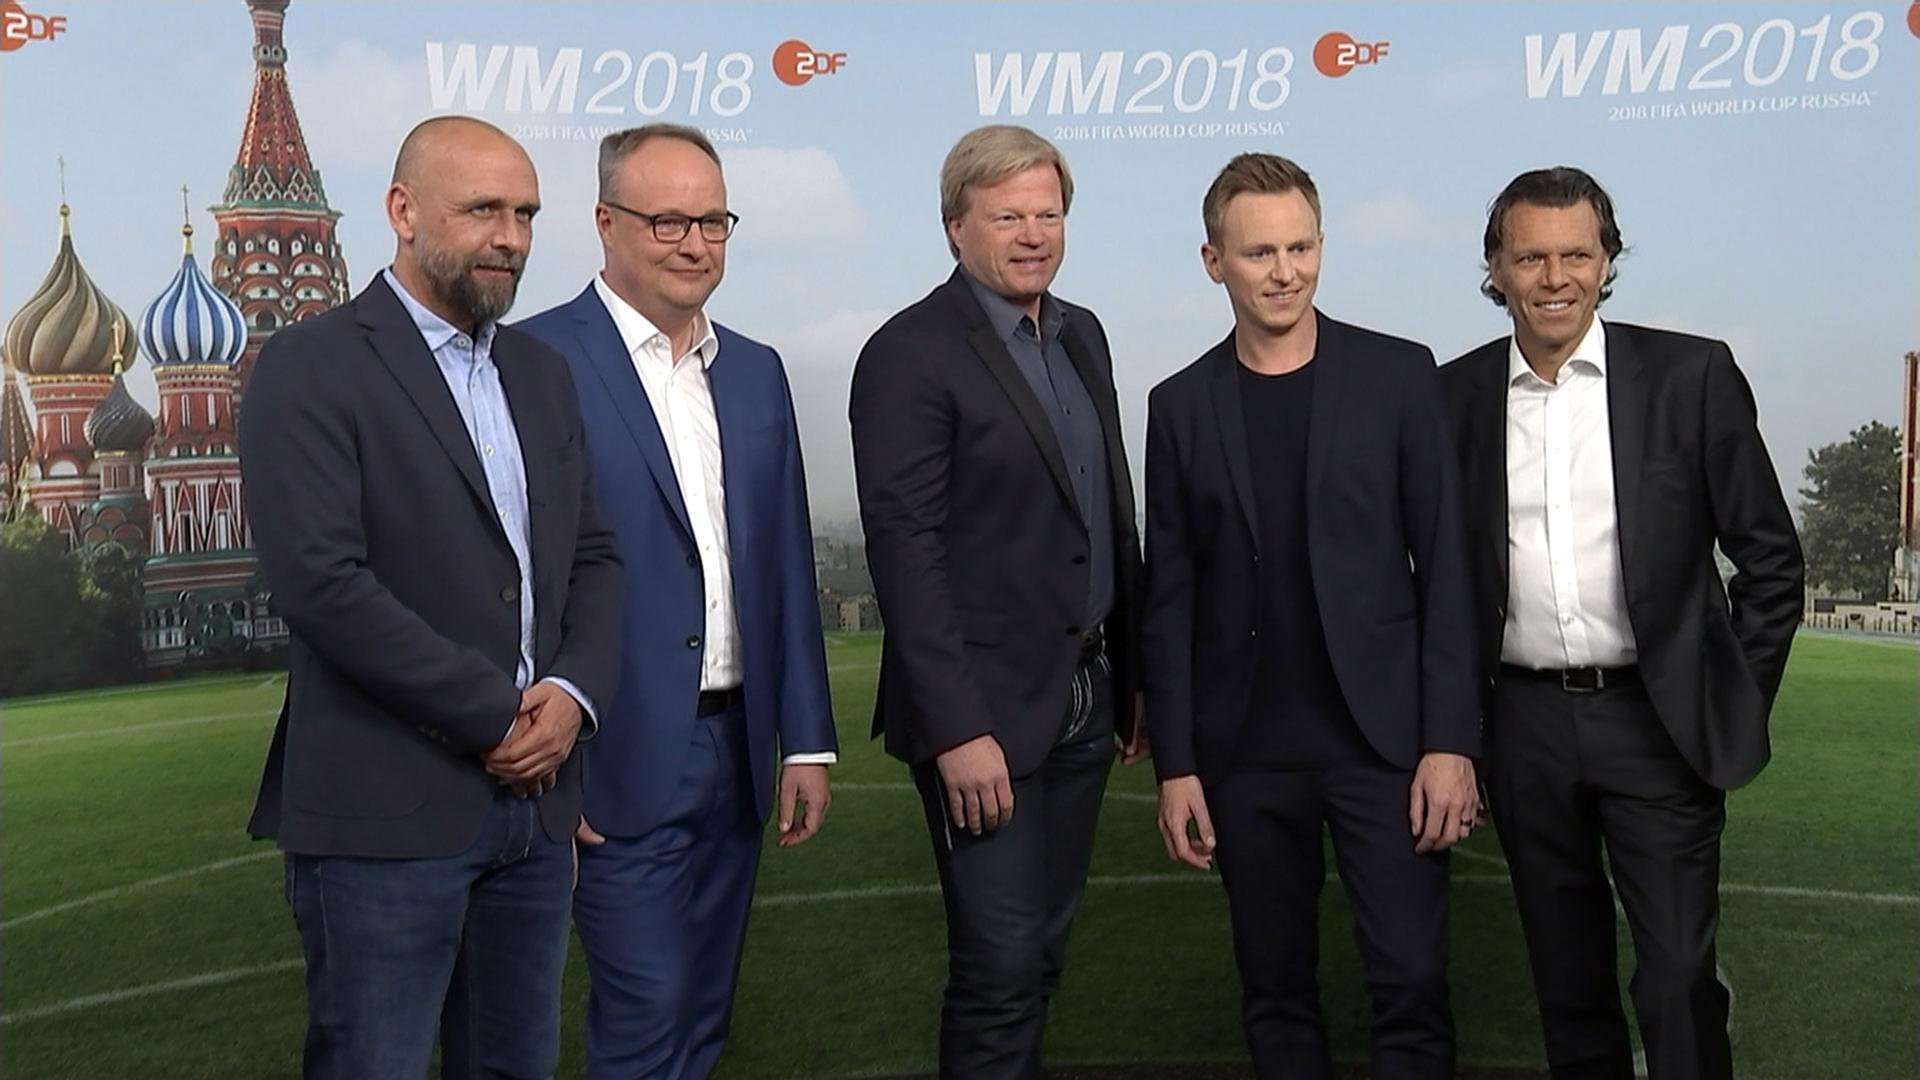 Christoph Kramer Wird Zdf Wm Experte Zdfmediathek